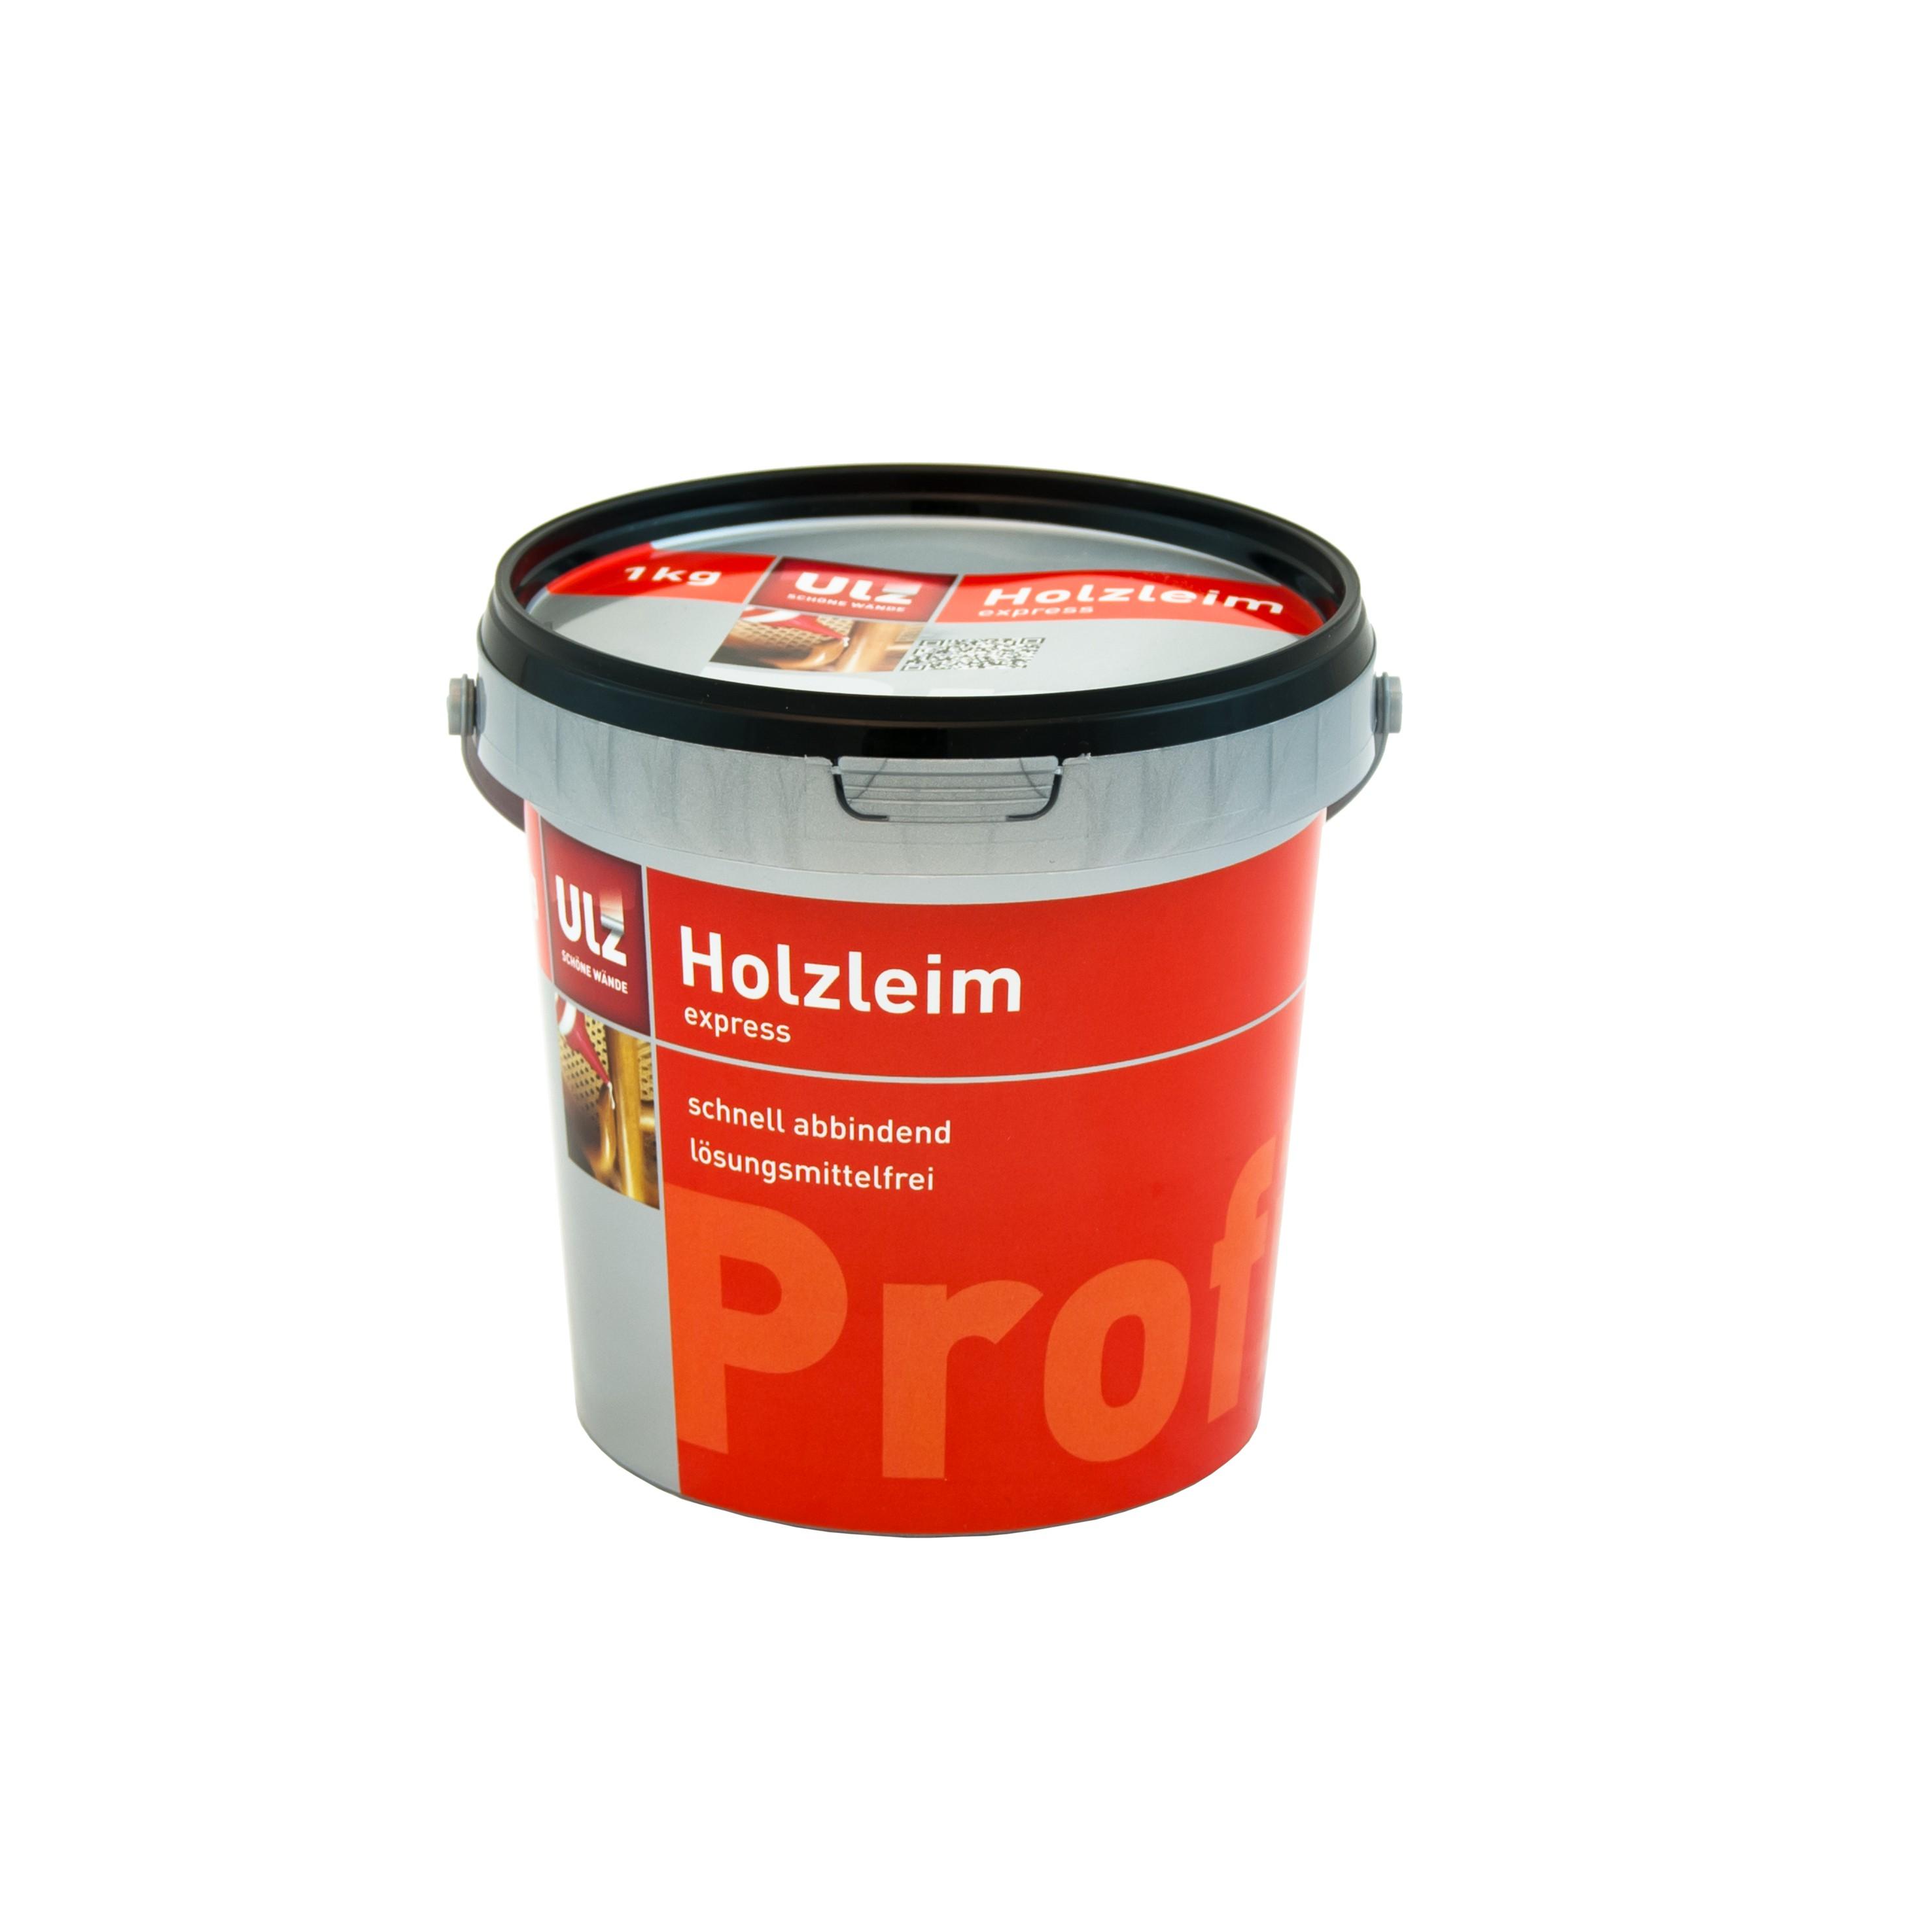 Holzleim express 1kg